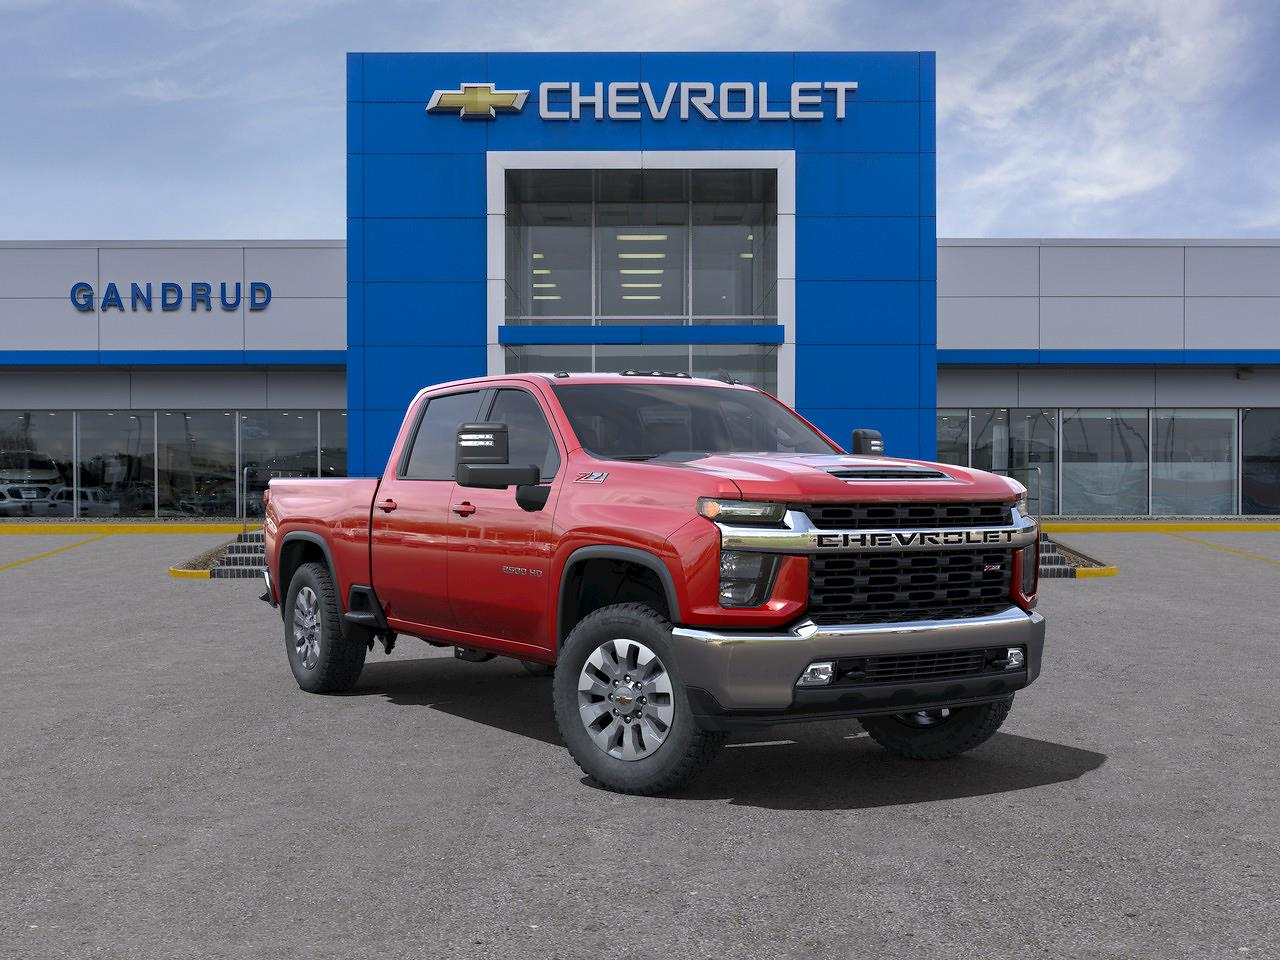 2021 Chevrolet Silverado 2500 Crew Cab 4x4, Pickup #M1387 - photo 1